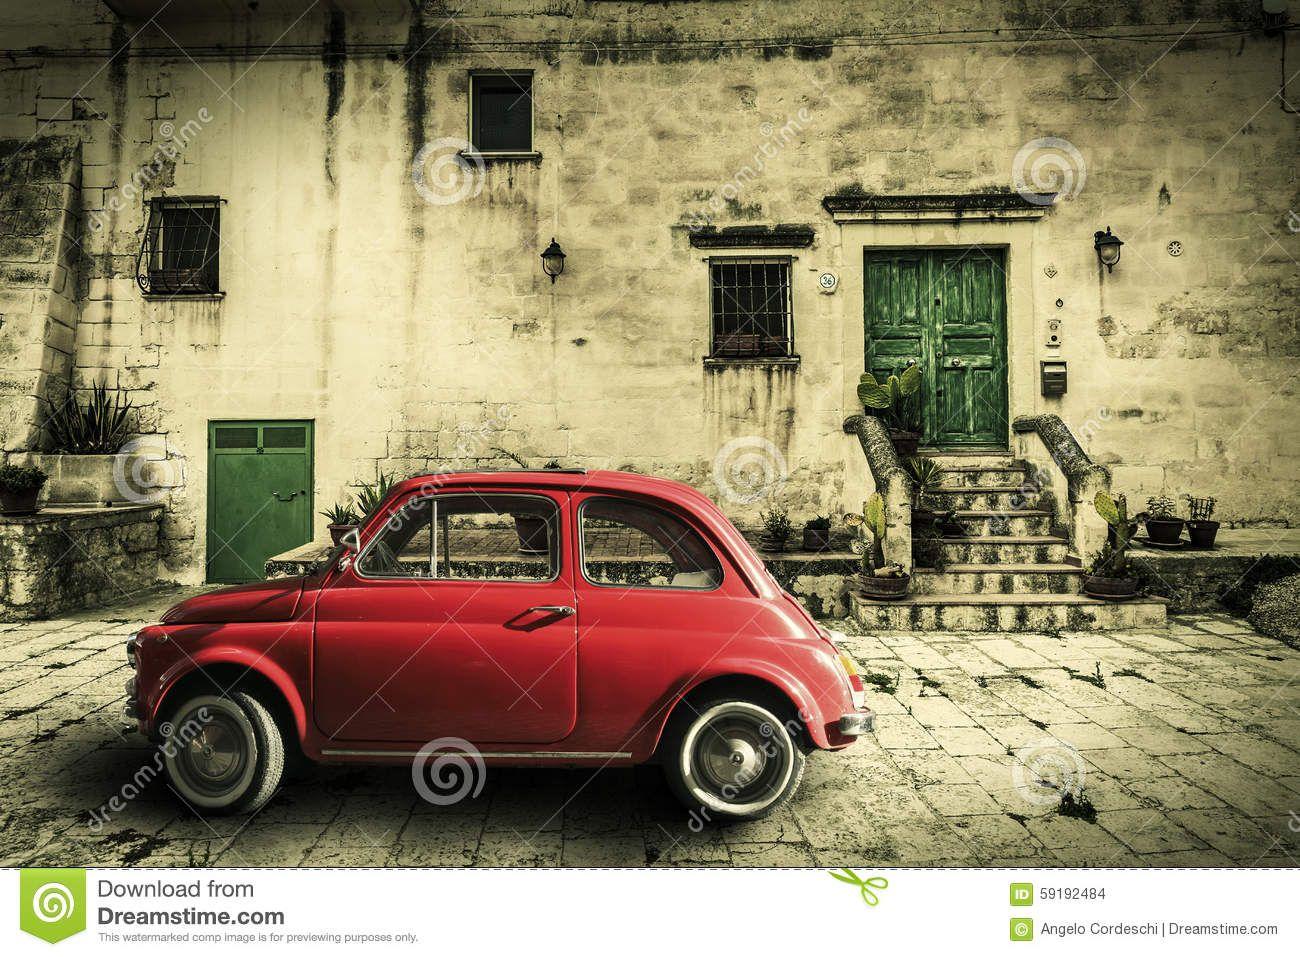 vintage - Google Search   Real Images   Pinterest   Vintage italian